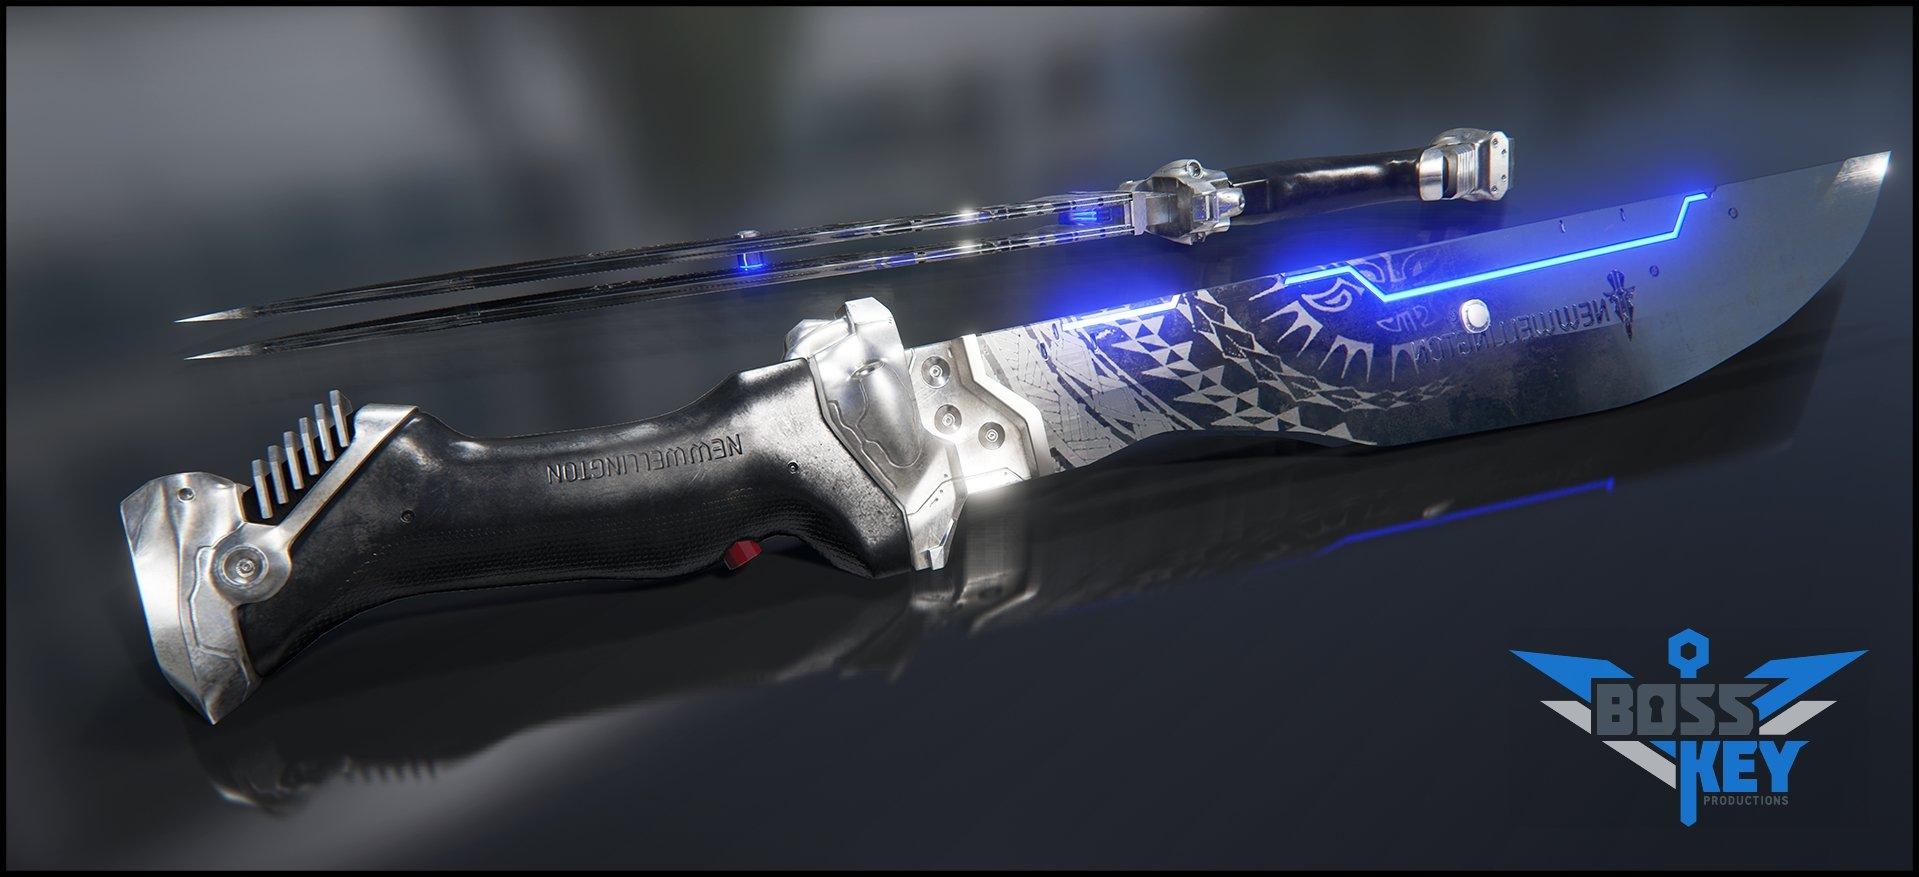 Boss key productions concept art depository taser machete 02 wm